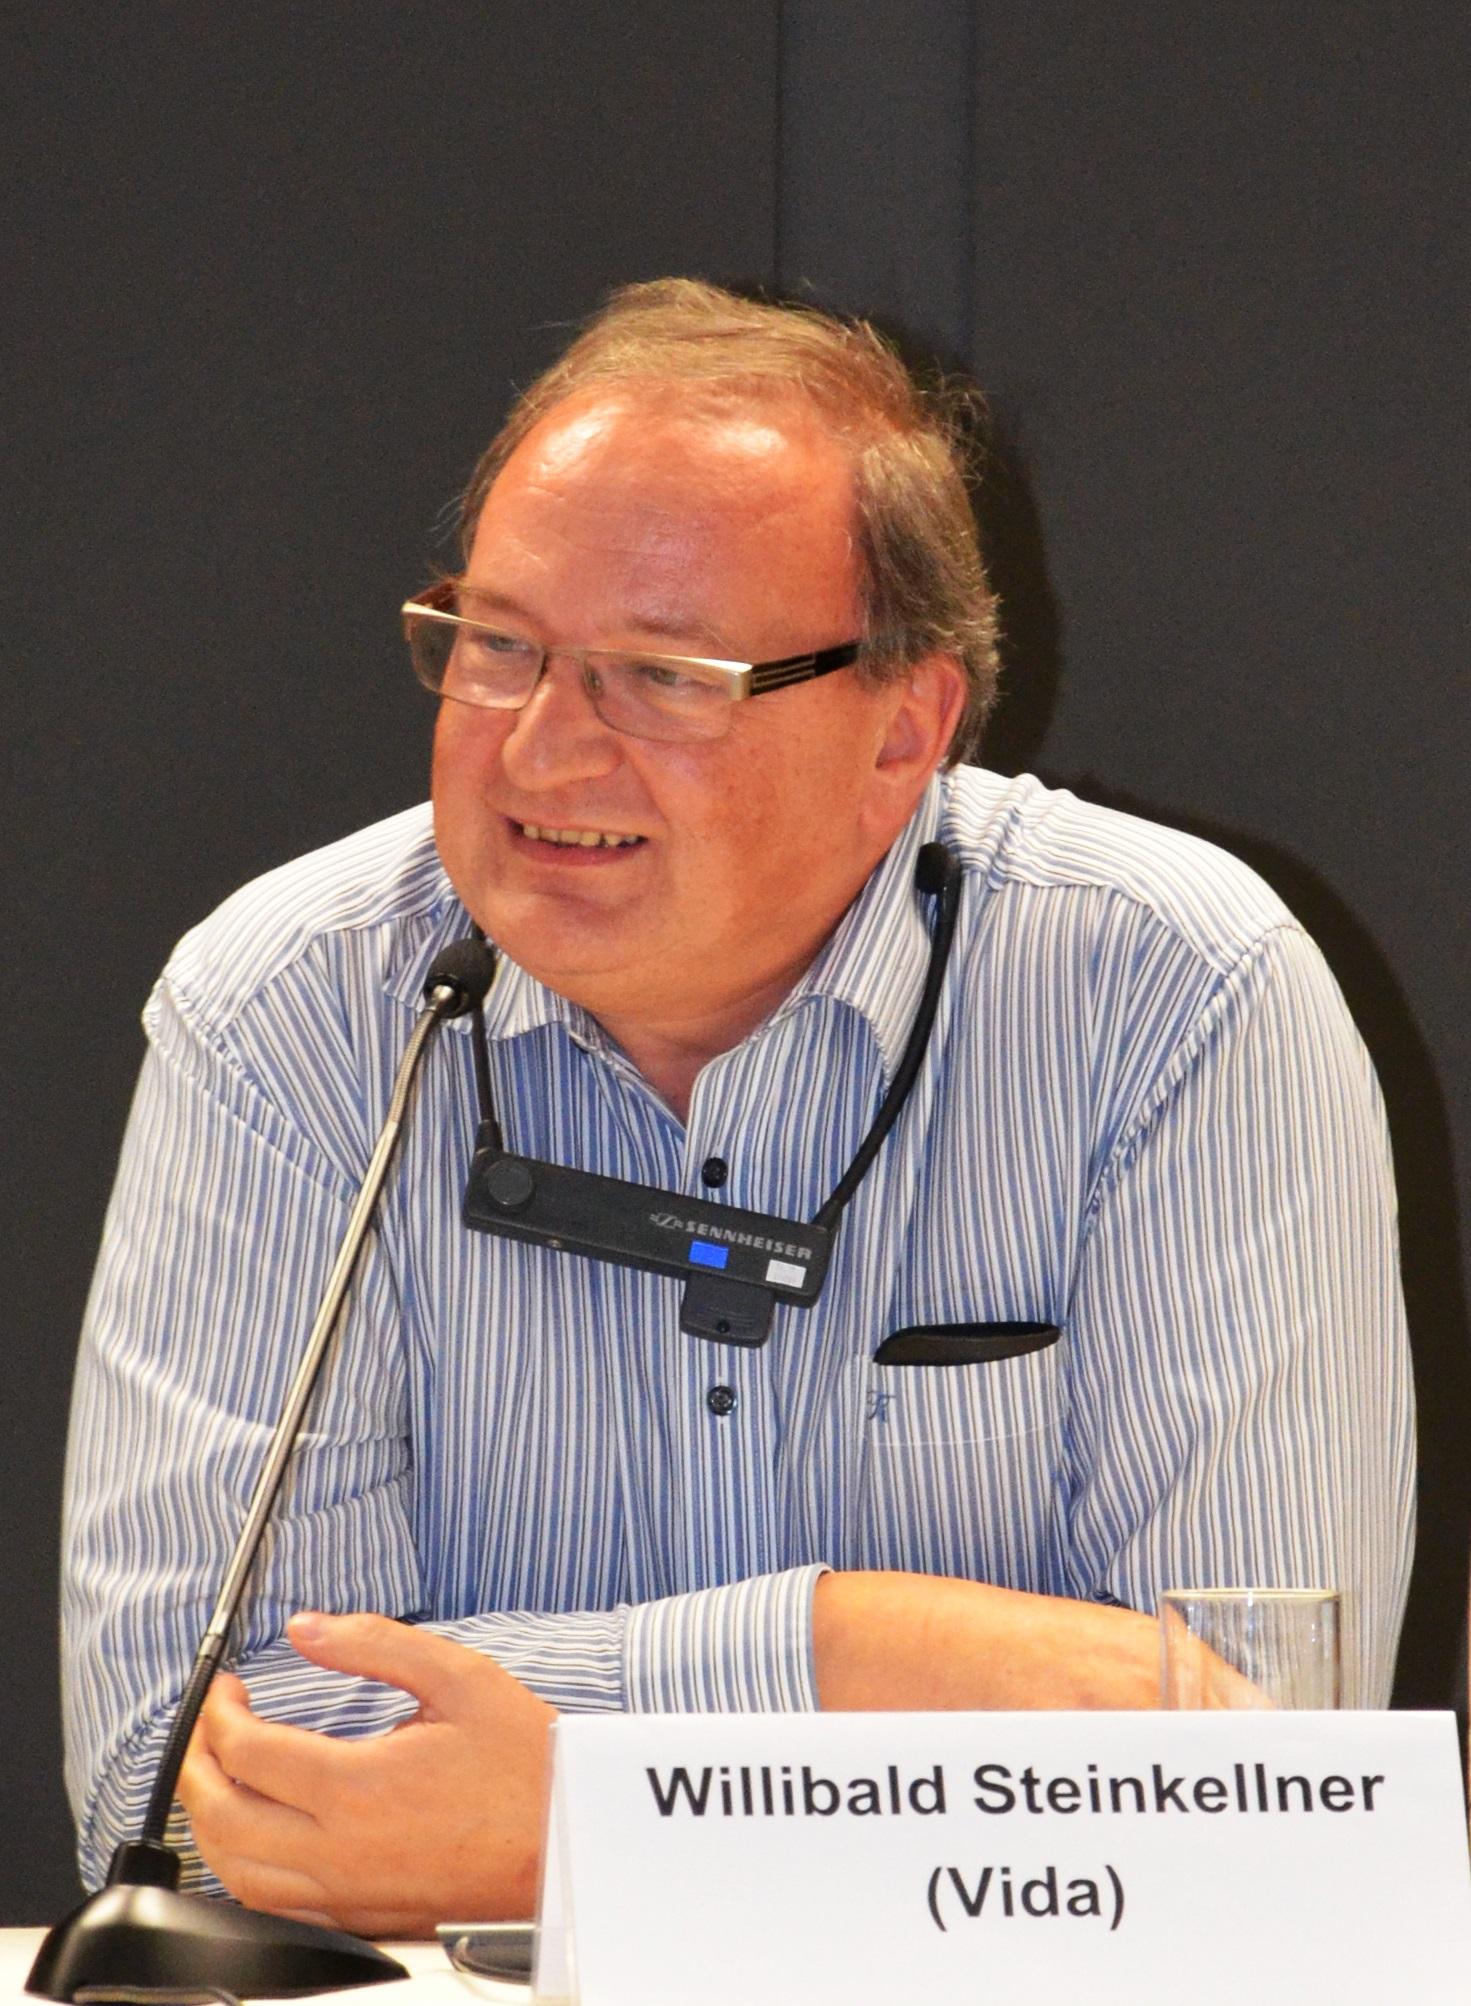 Willibald Steinkellner